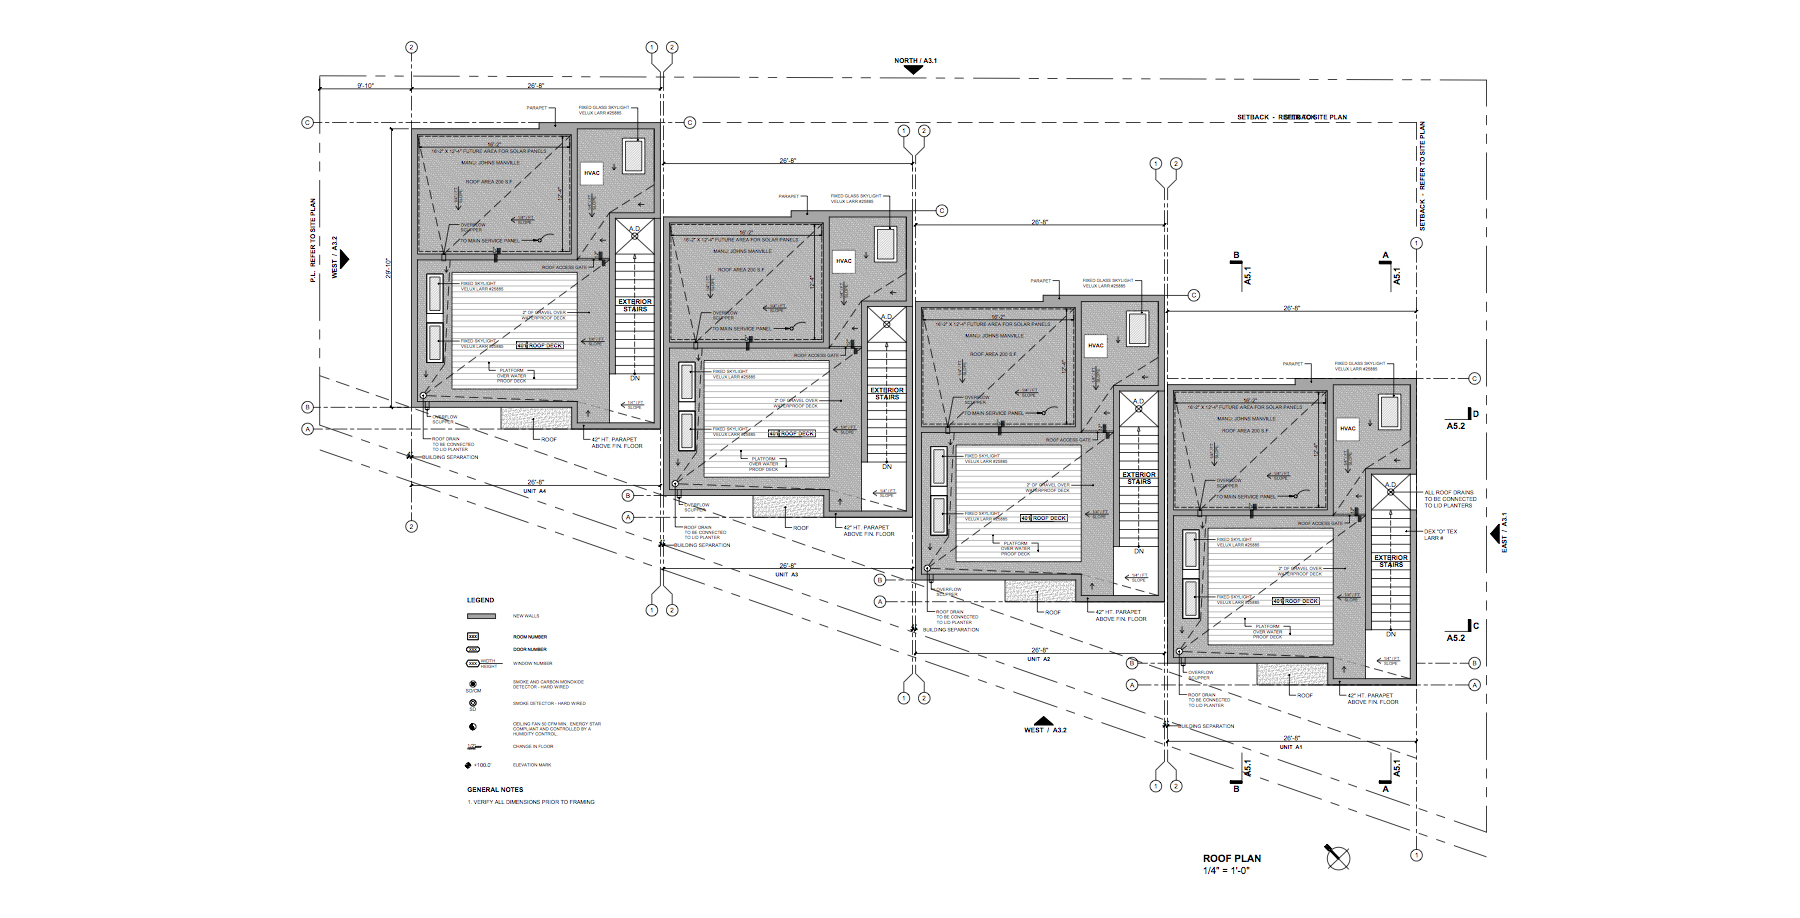 SB_170210_Roof plan.jpg